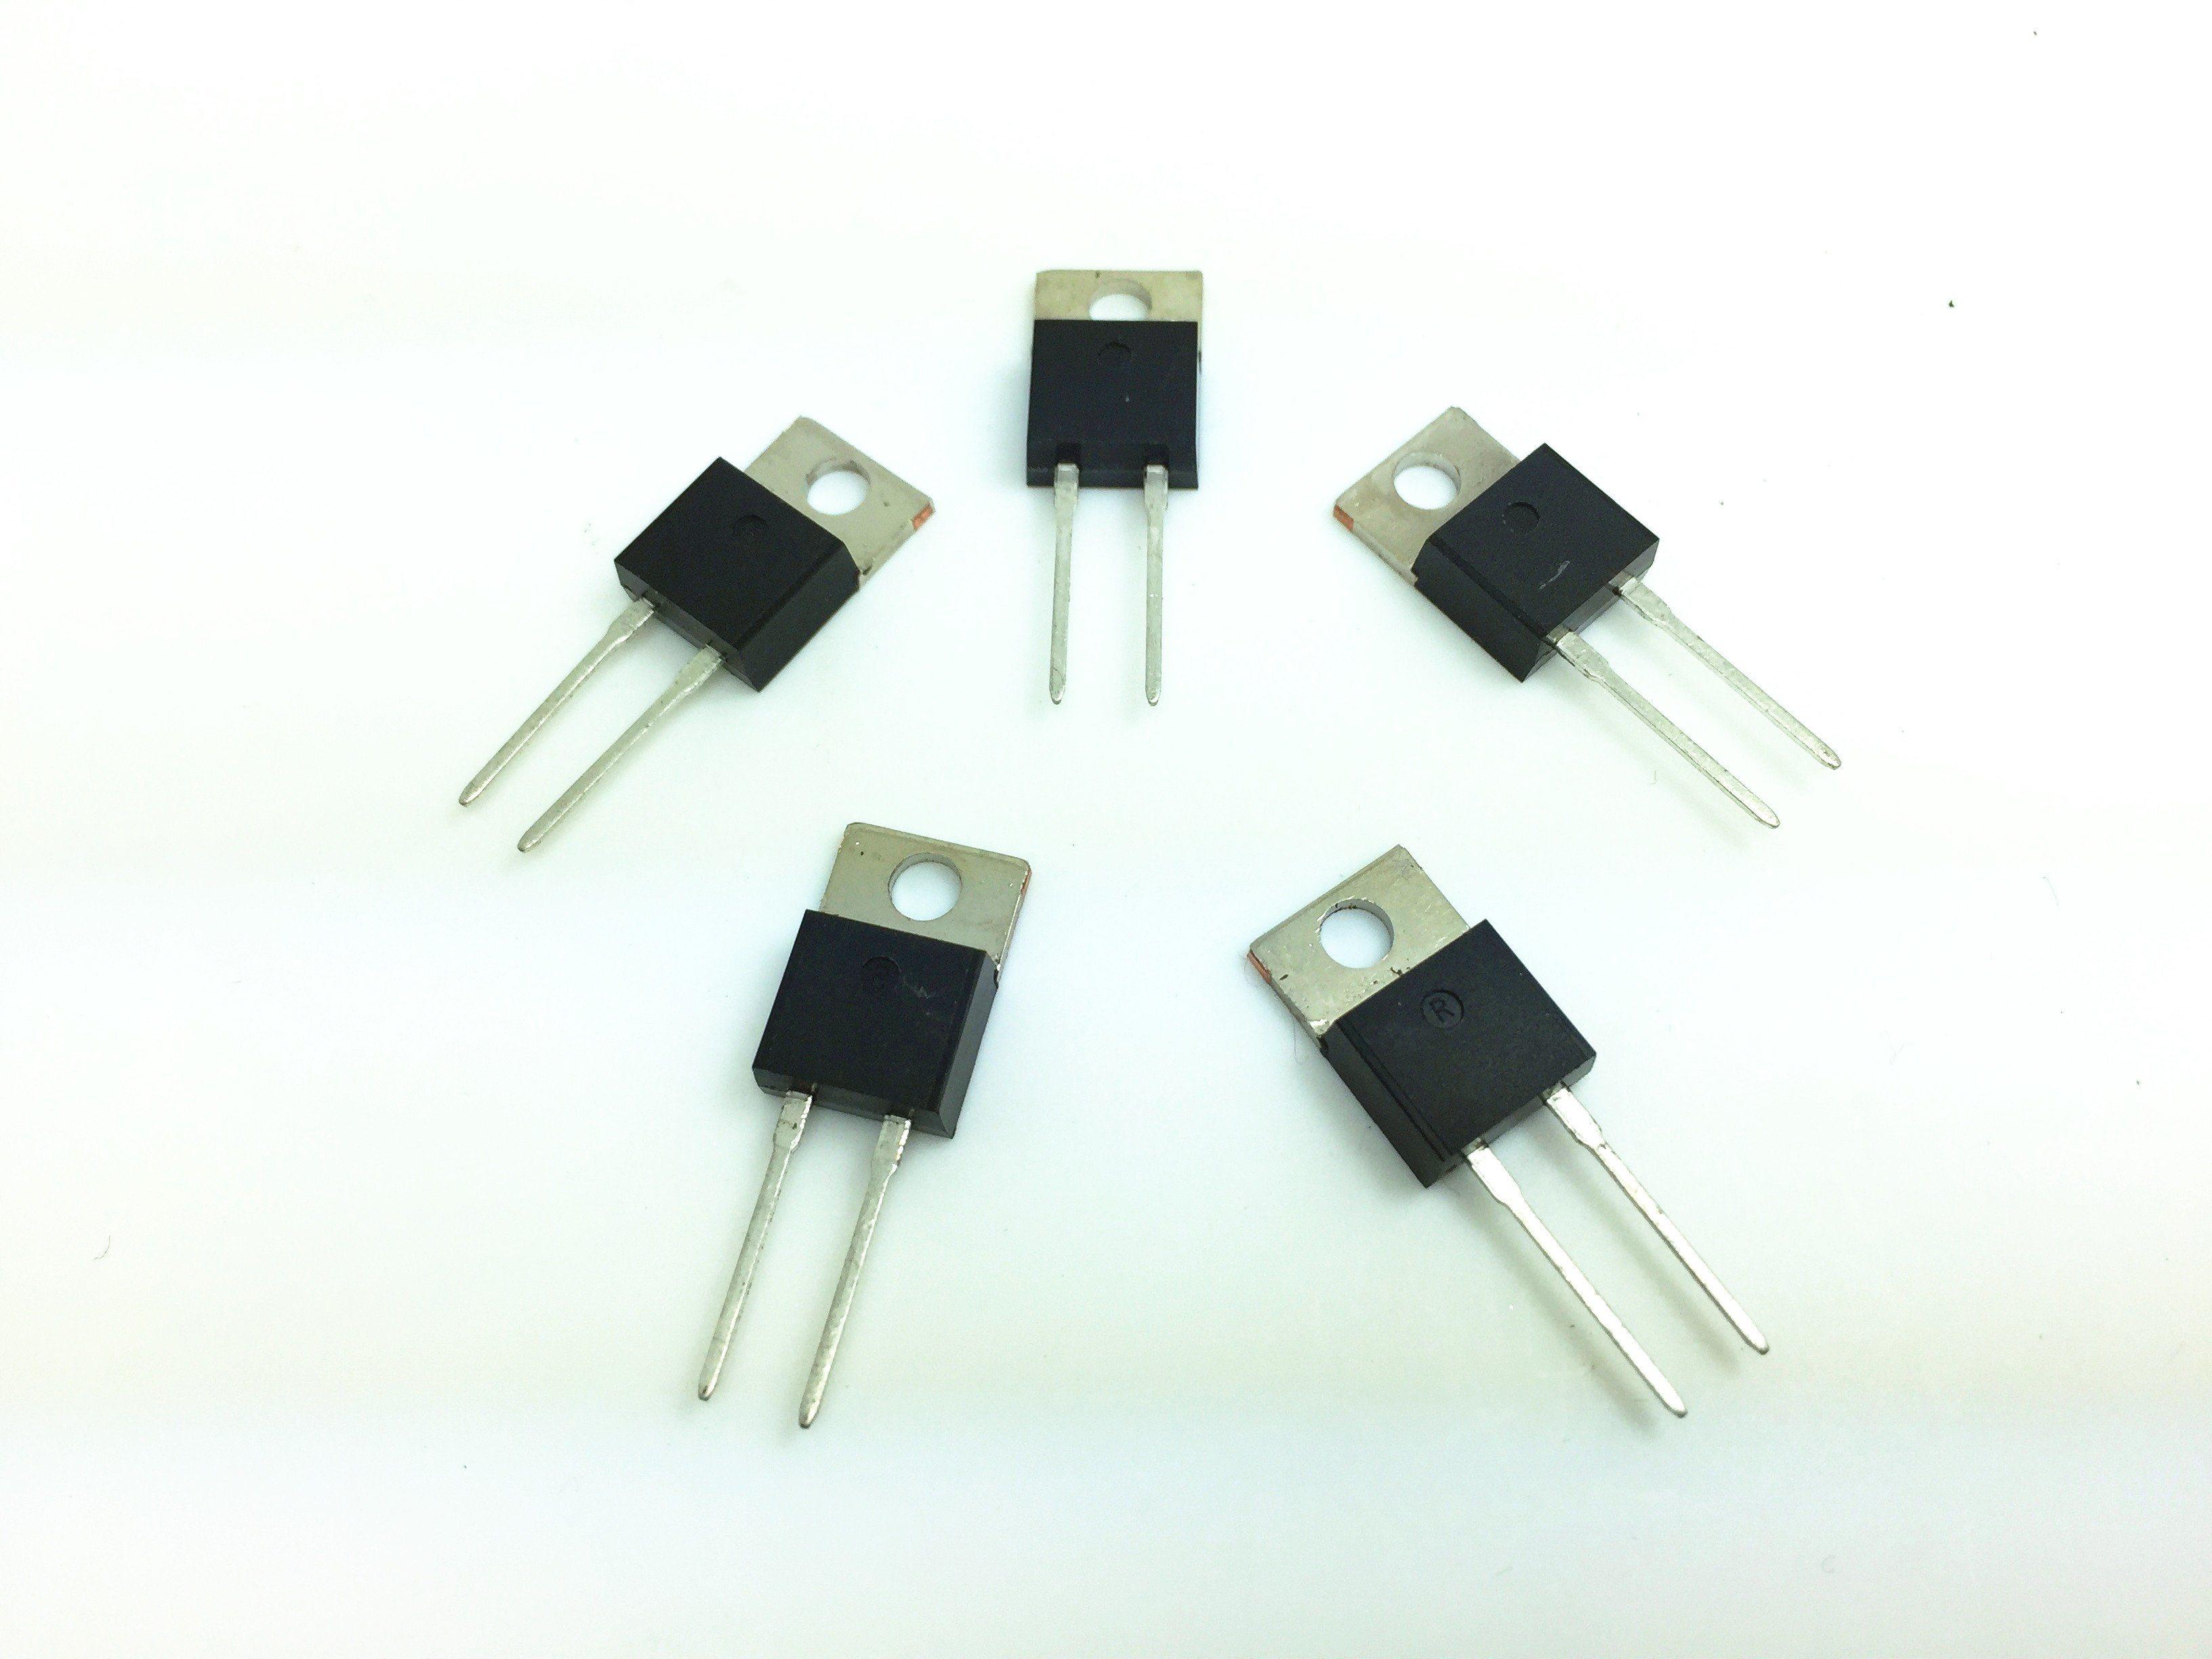 To220 Style Power Film Resistor